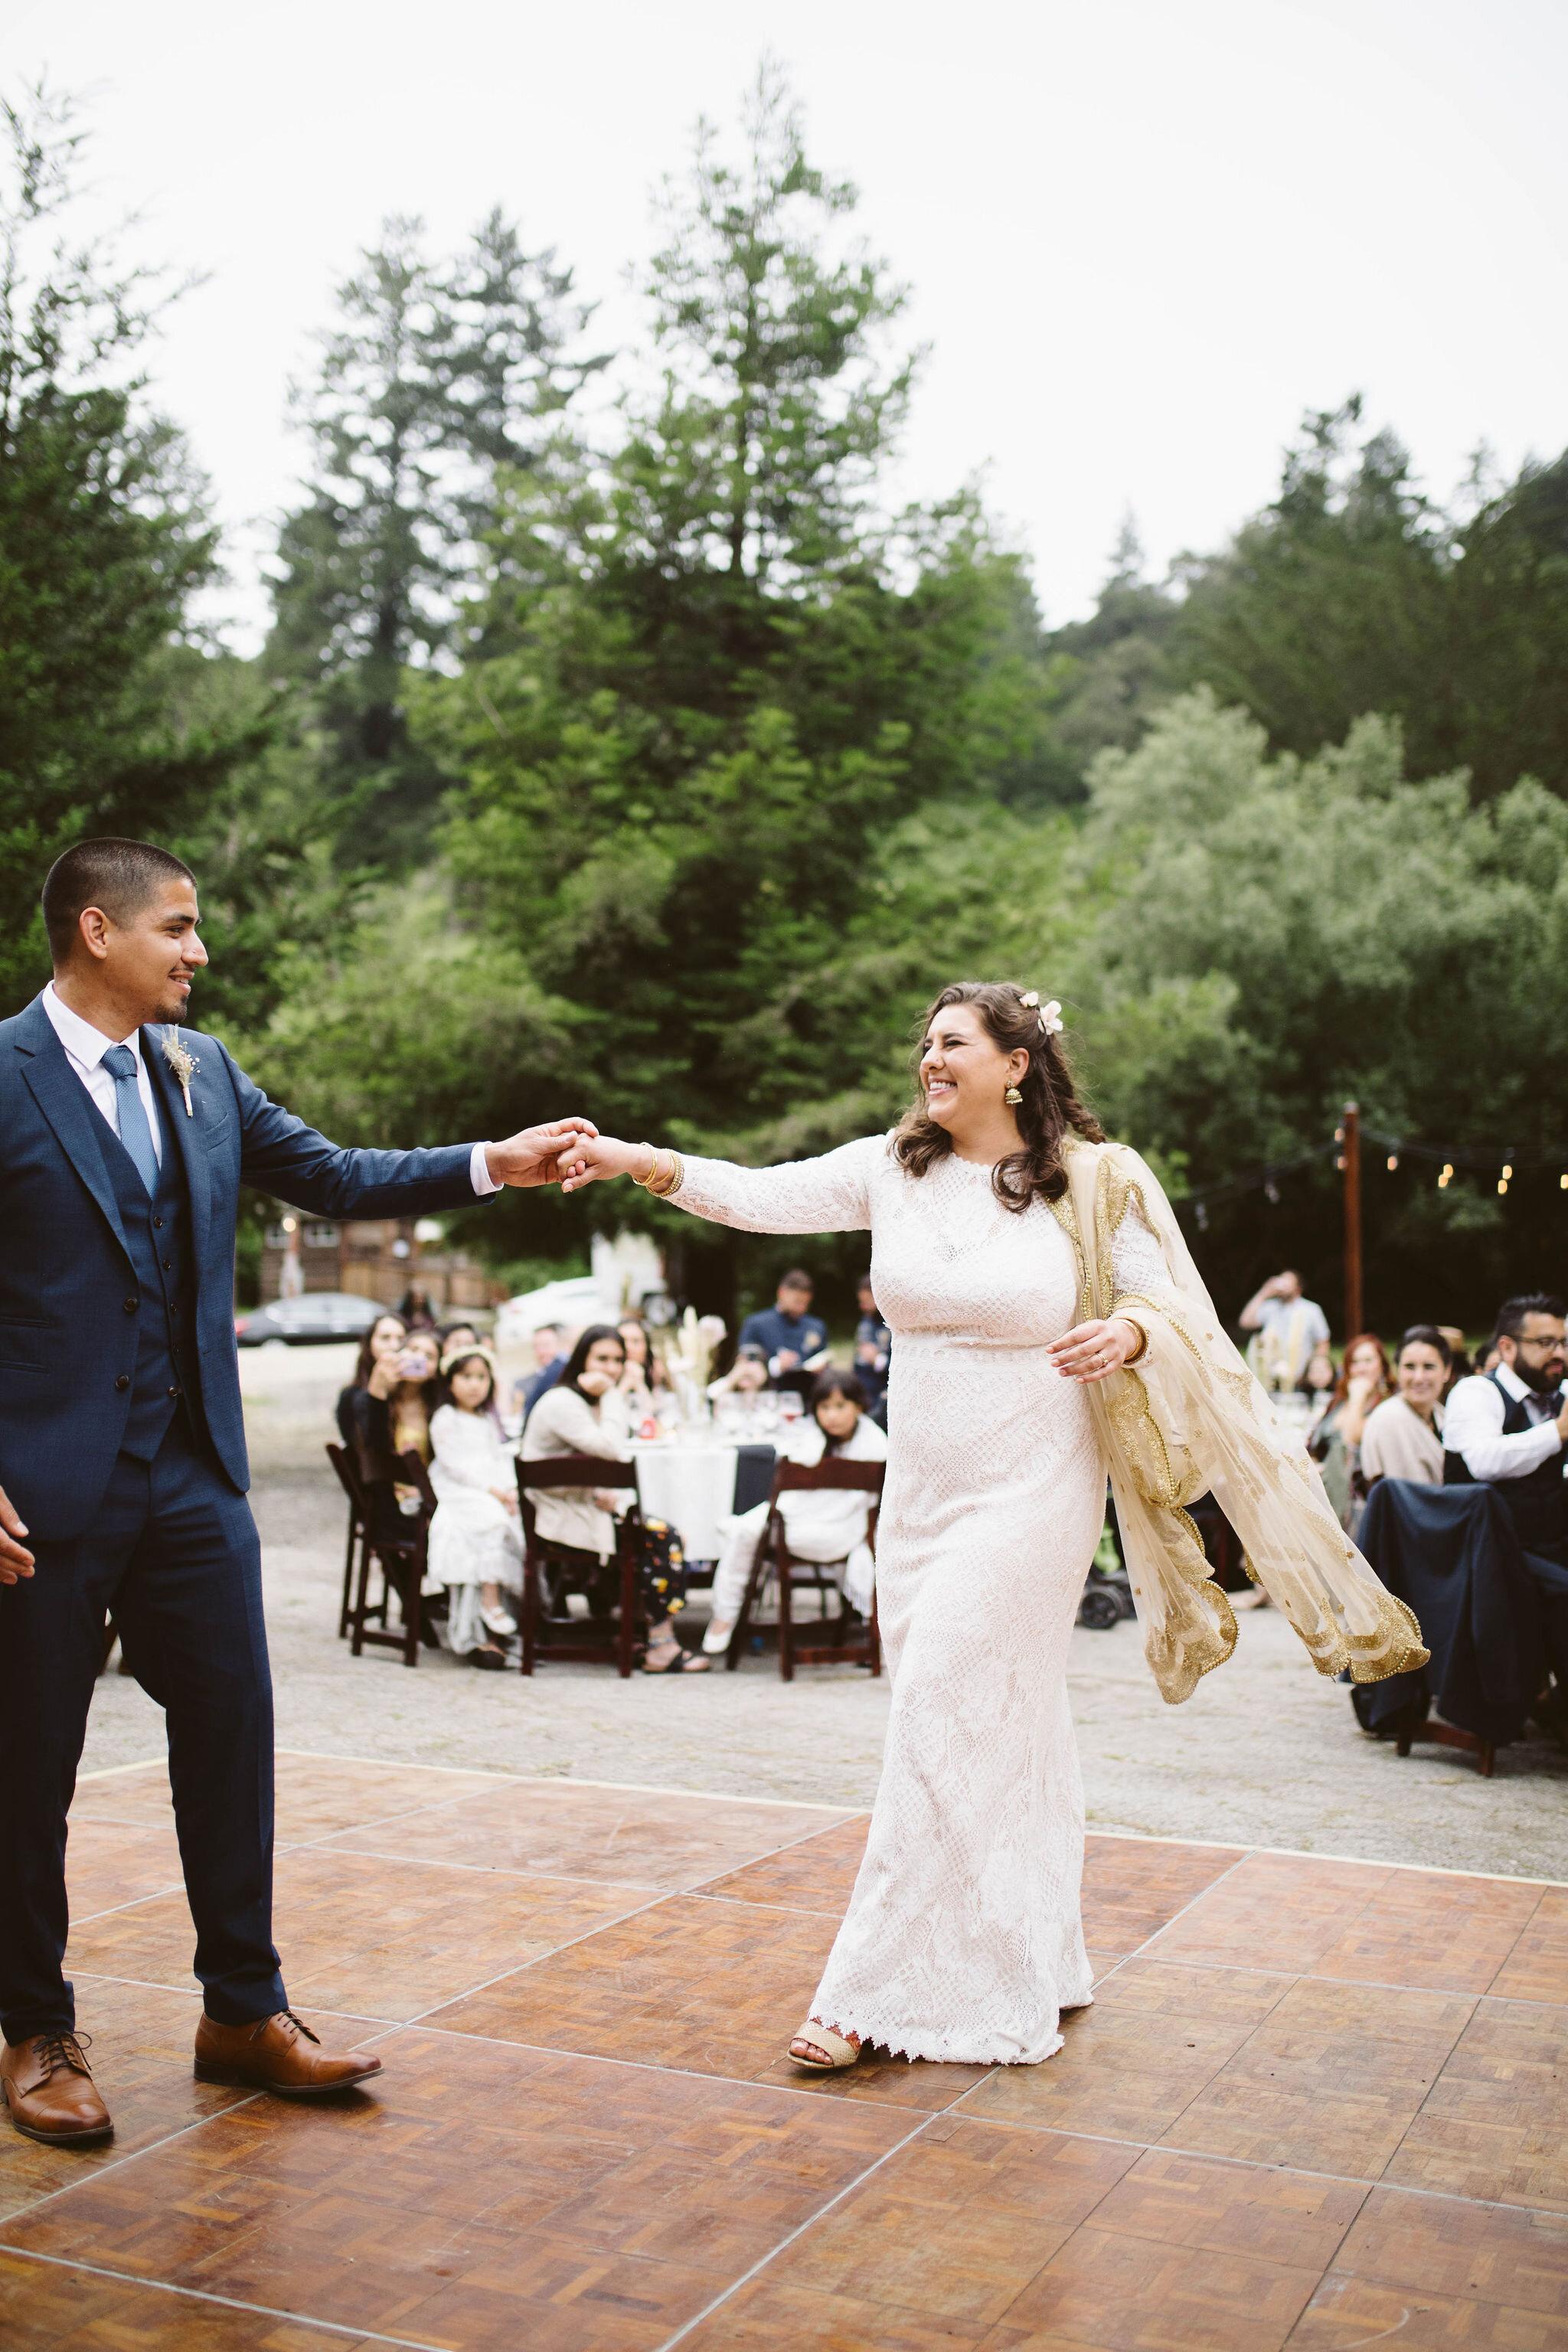 Venture-Retreat-Center-Wedding-Pescadero-Sat-Aaron-Pritam-The-Shalom-Imaginative-606.jpg